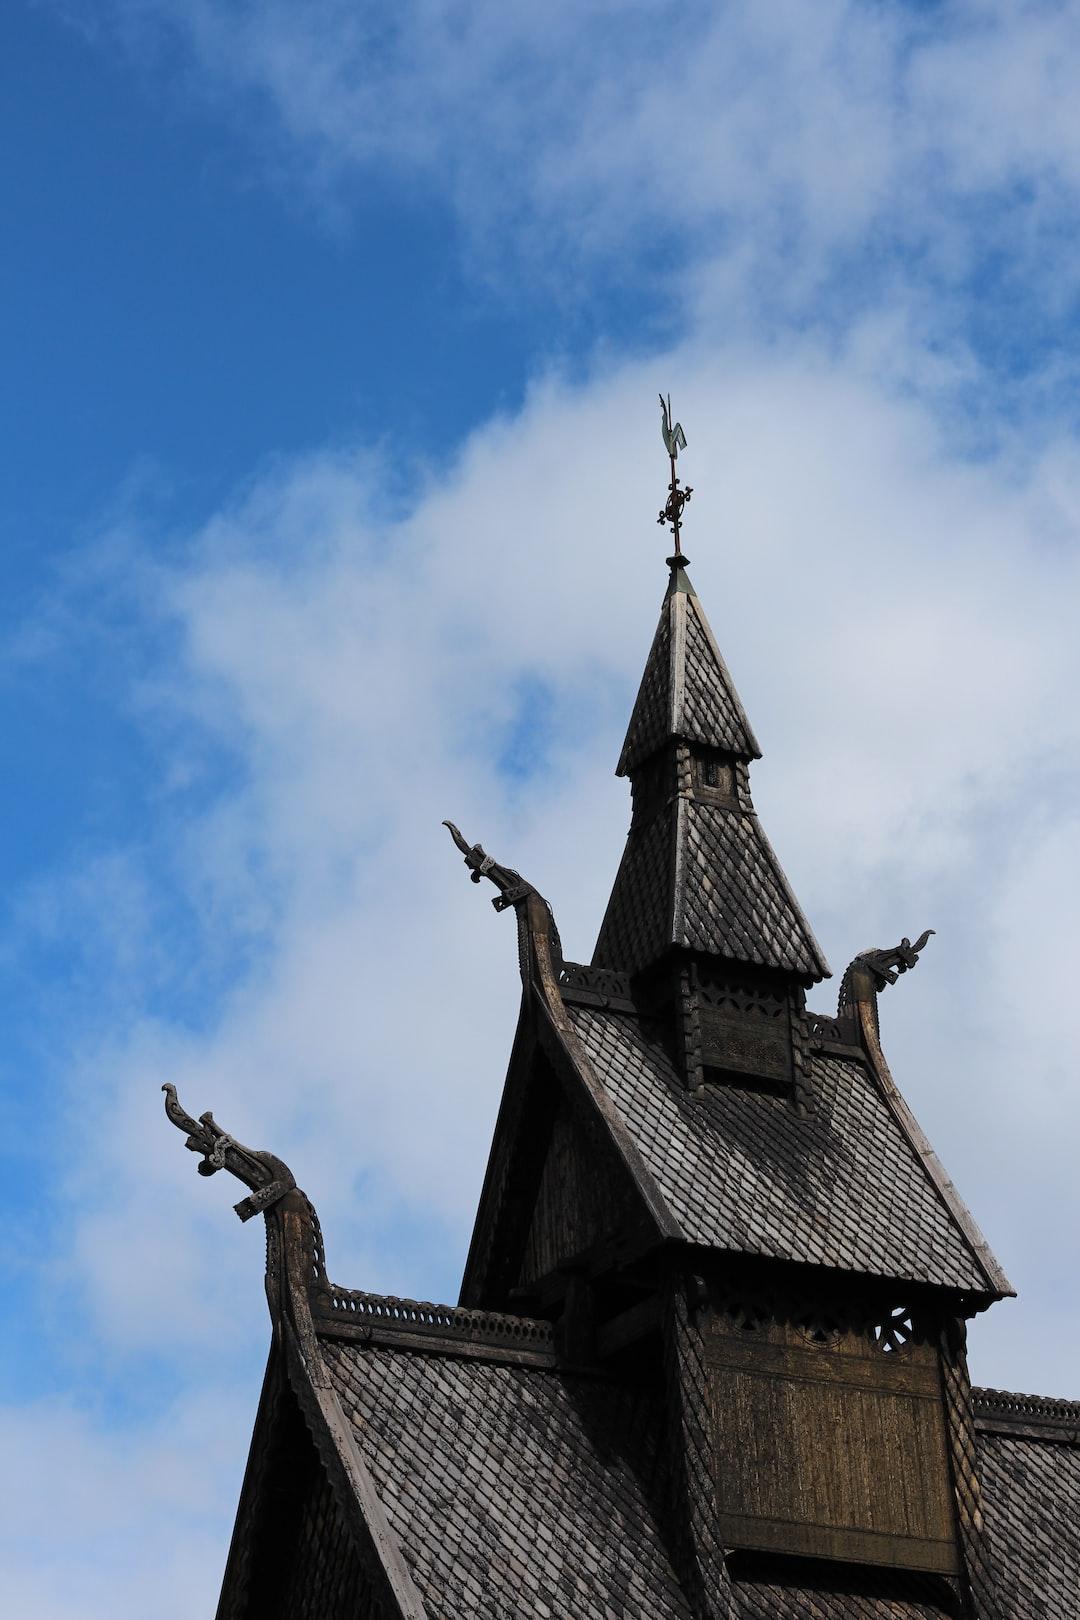 Hopperstad Stavkirke (Stave Church), Vik i Sogn, Norway